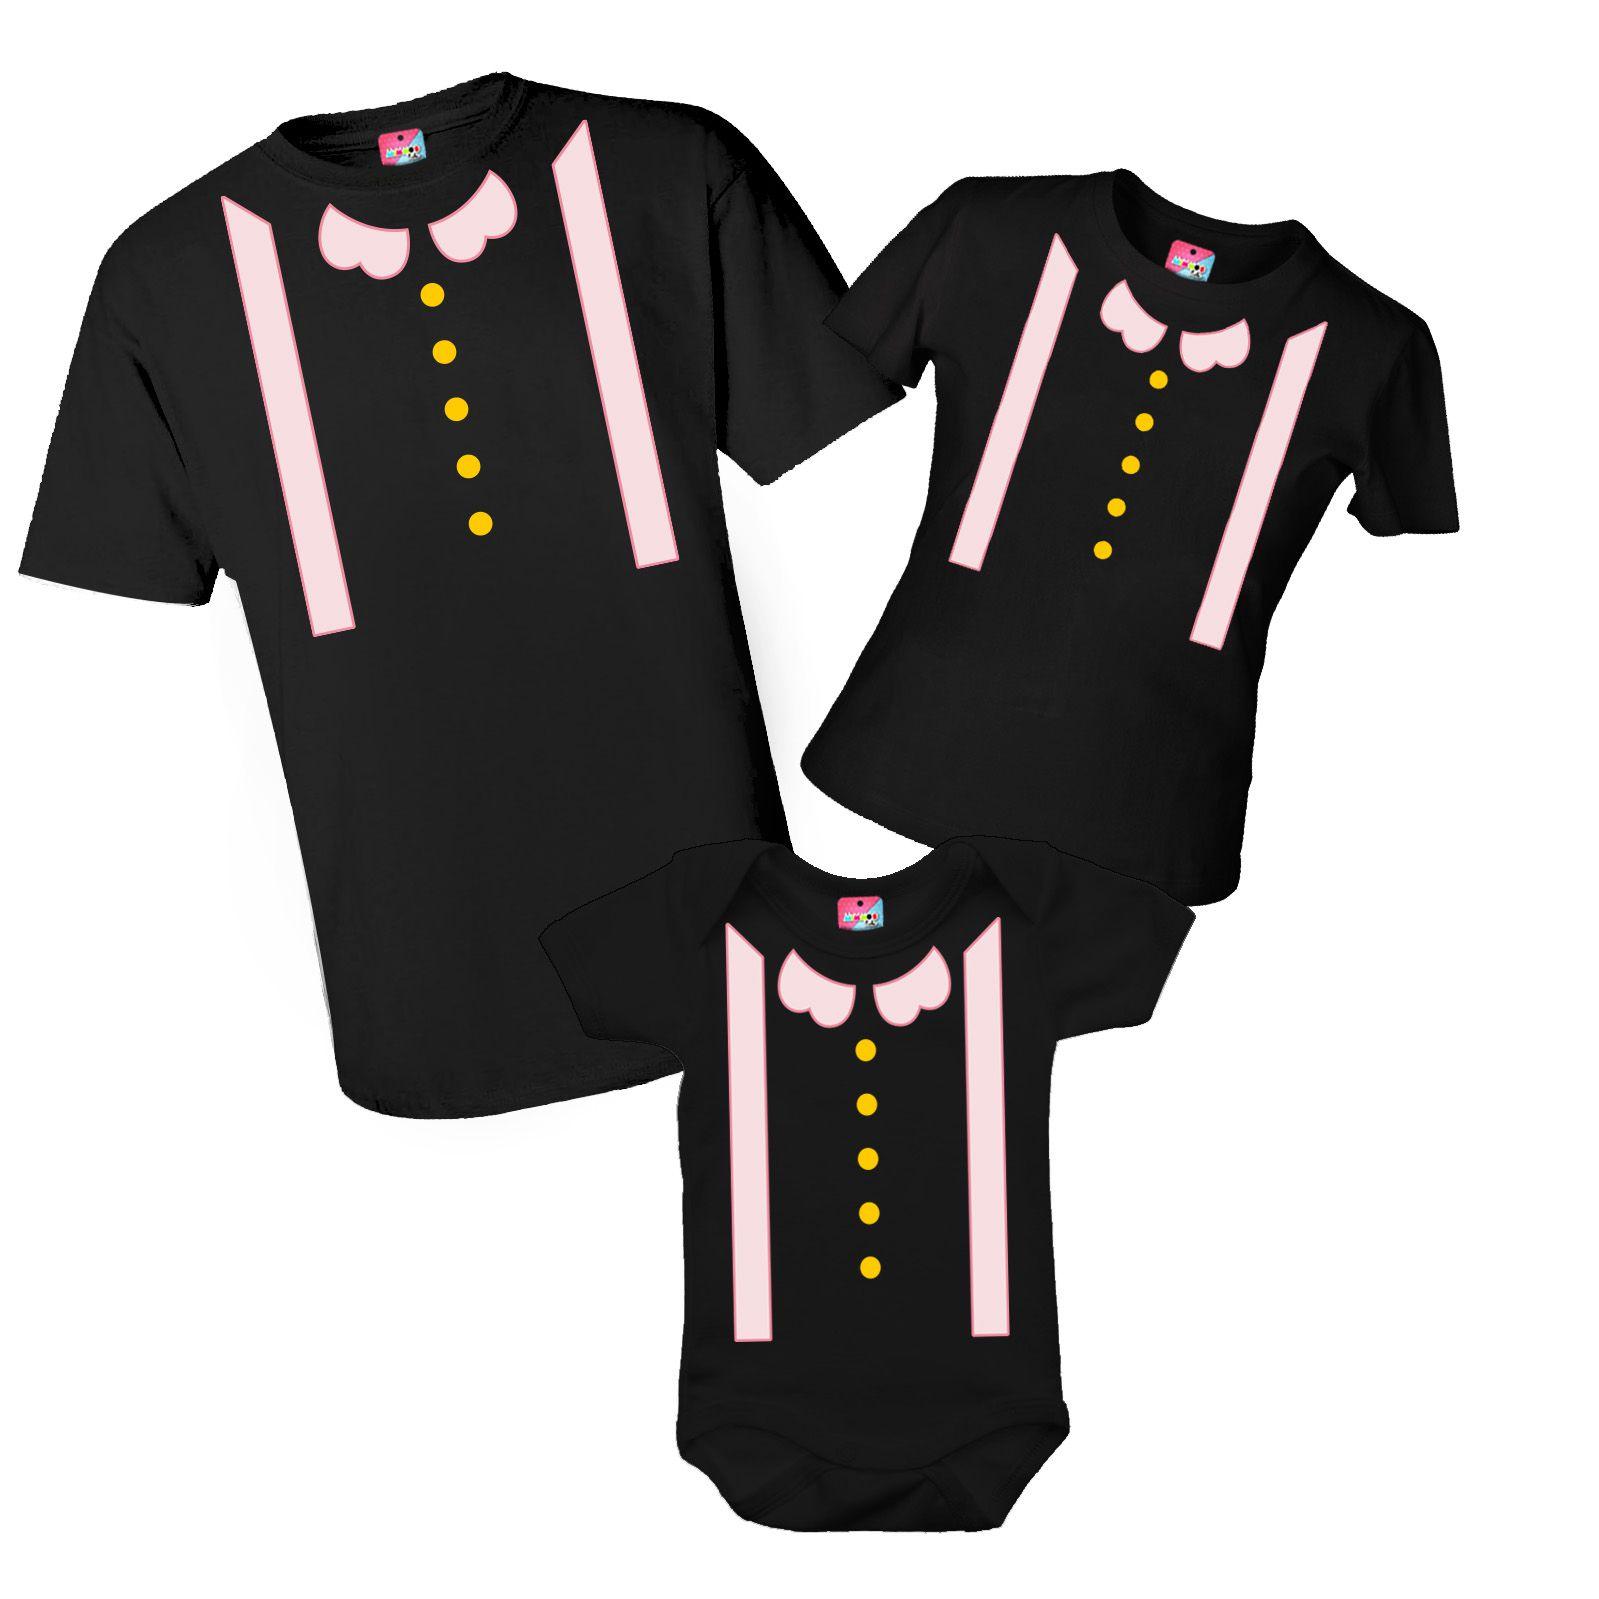 Kit camiseta e body aniversário - Mundo Bita preta